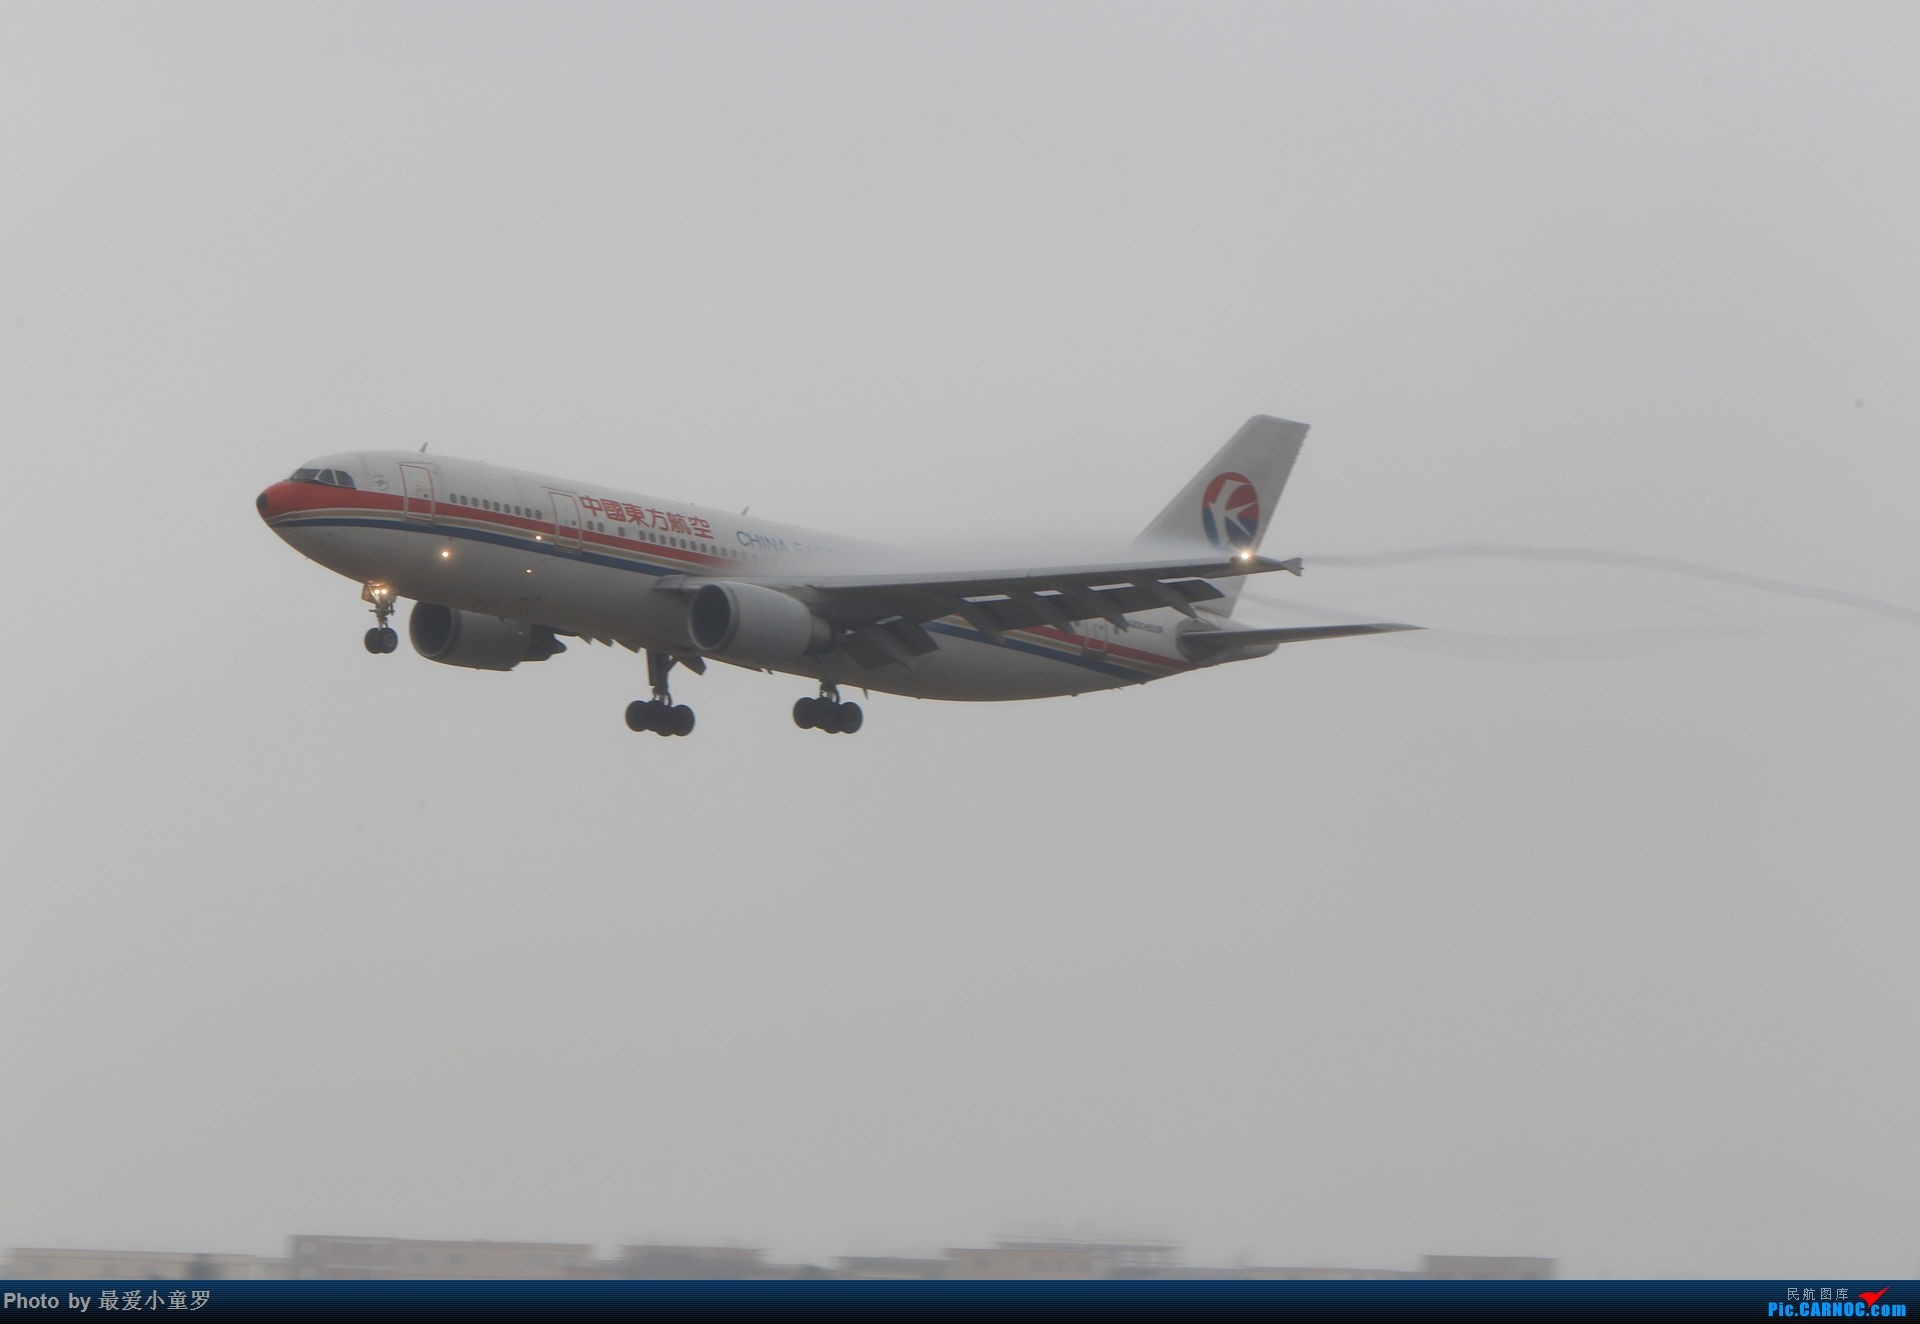 Re:[原创]旧的不去,新的不来——致2014远去的背影! AIRBUS A300B4-600 B-2325 中国广州白云国际机场